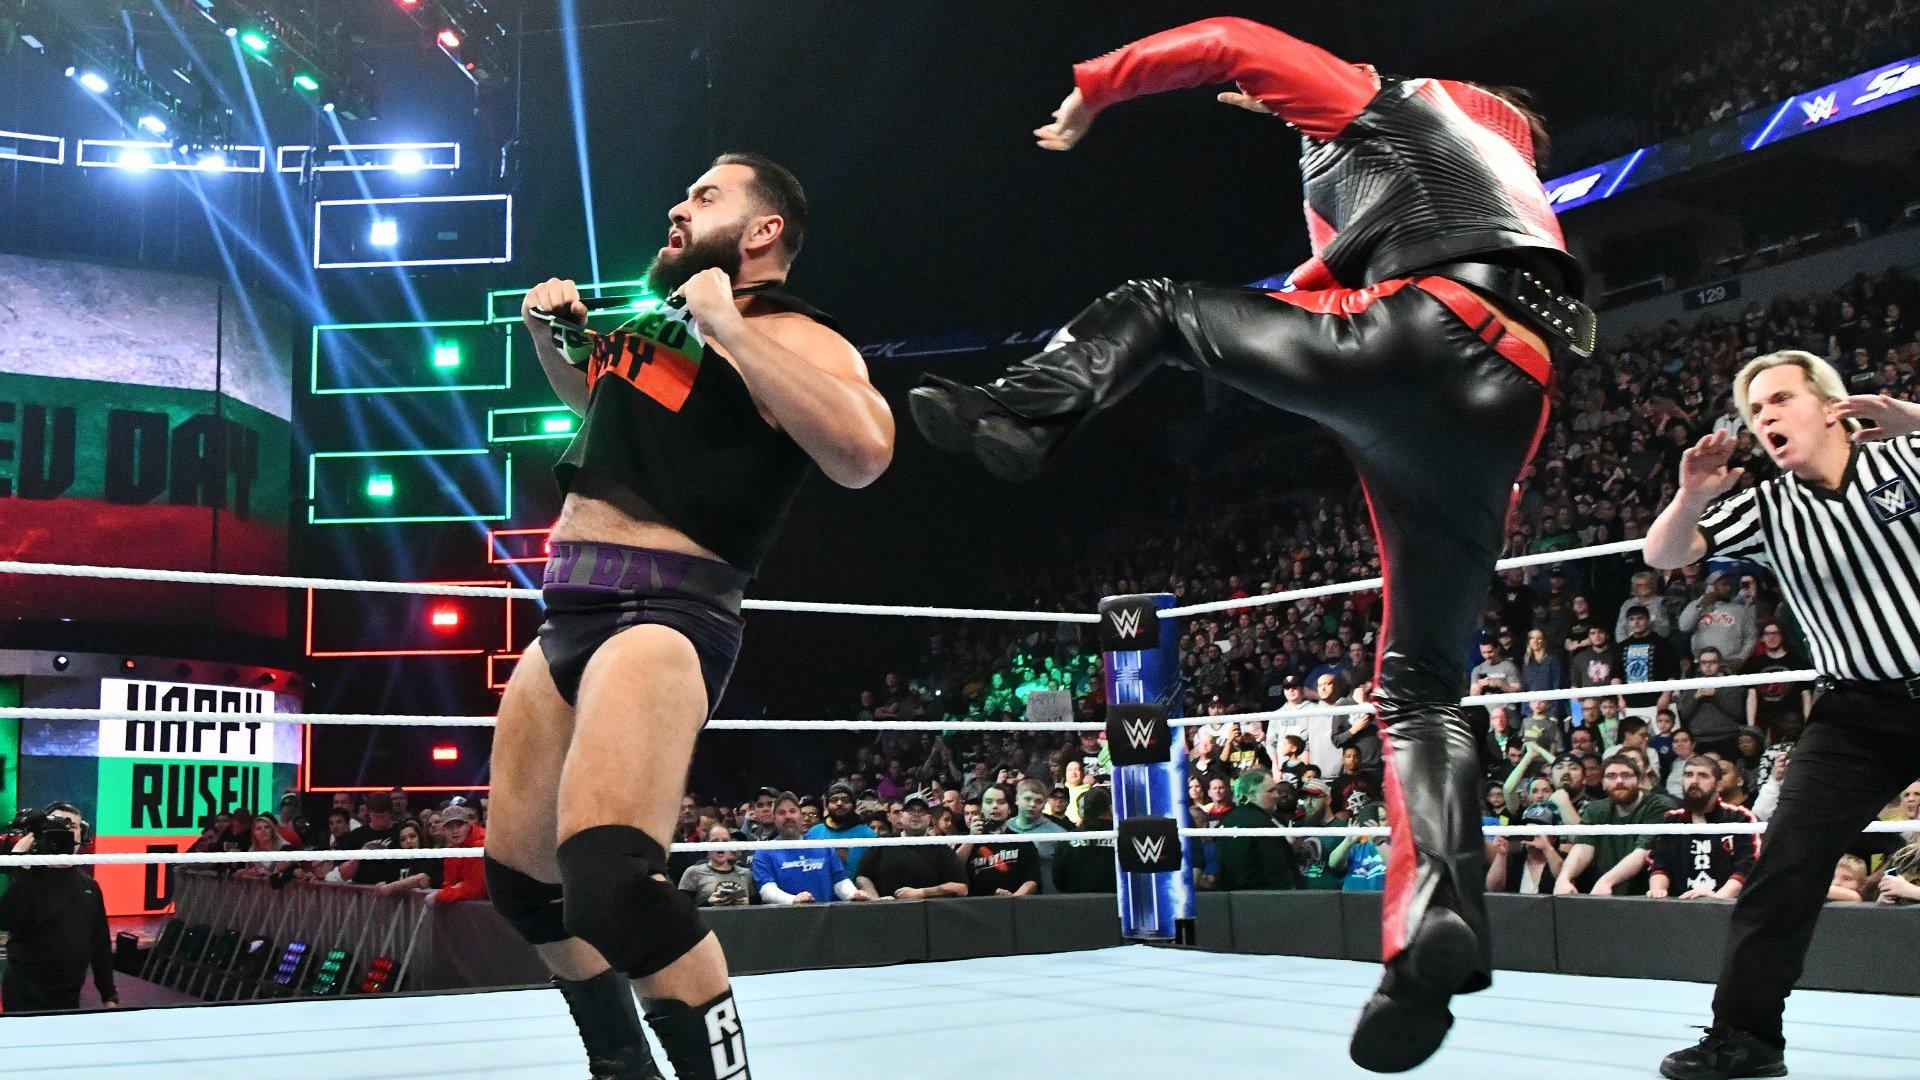 Shinsuke Nakamura attaque Rusev: SmackDown LIVE, 27 Novembre 2018